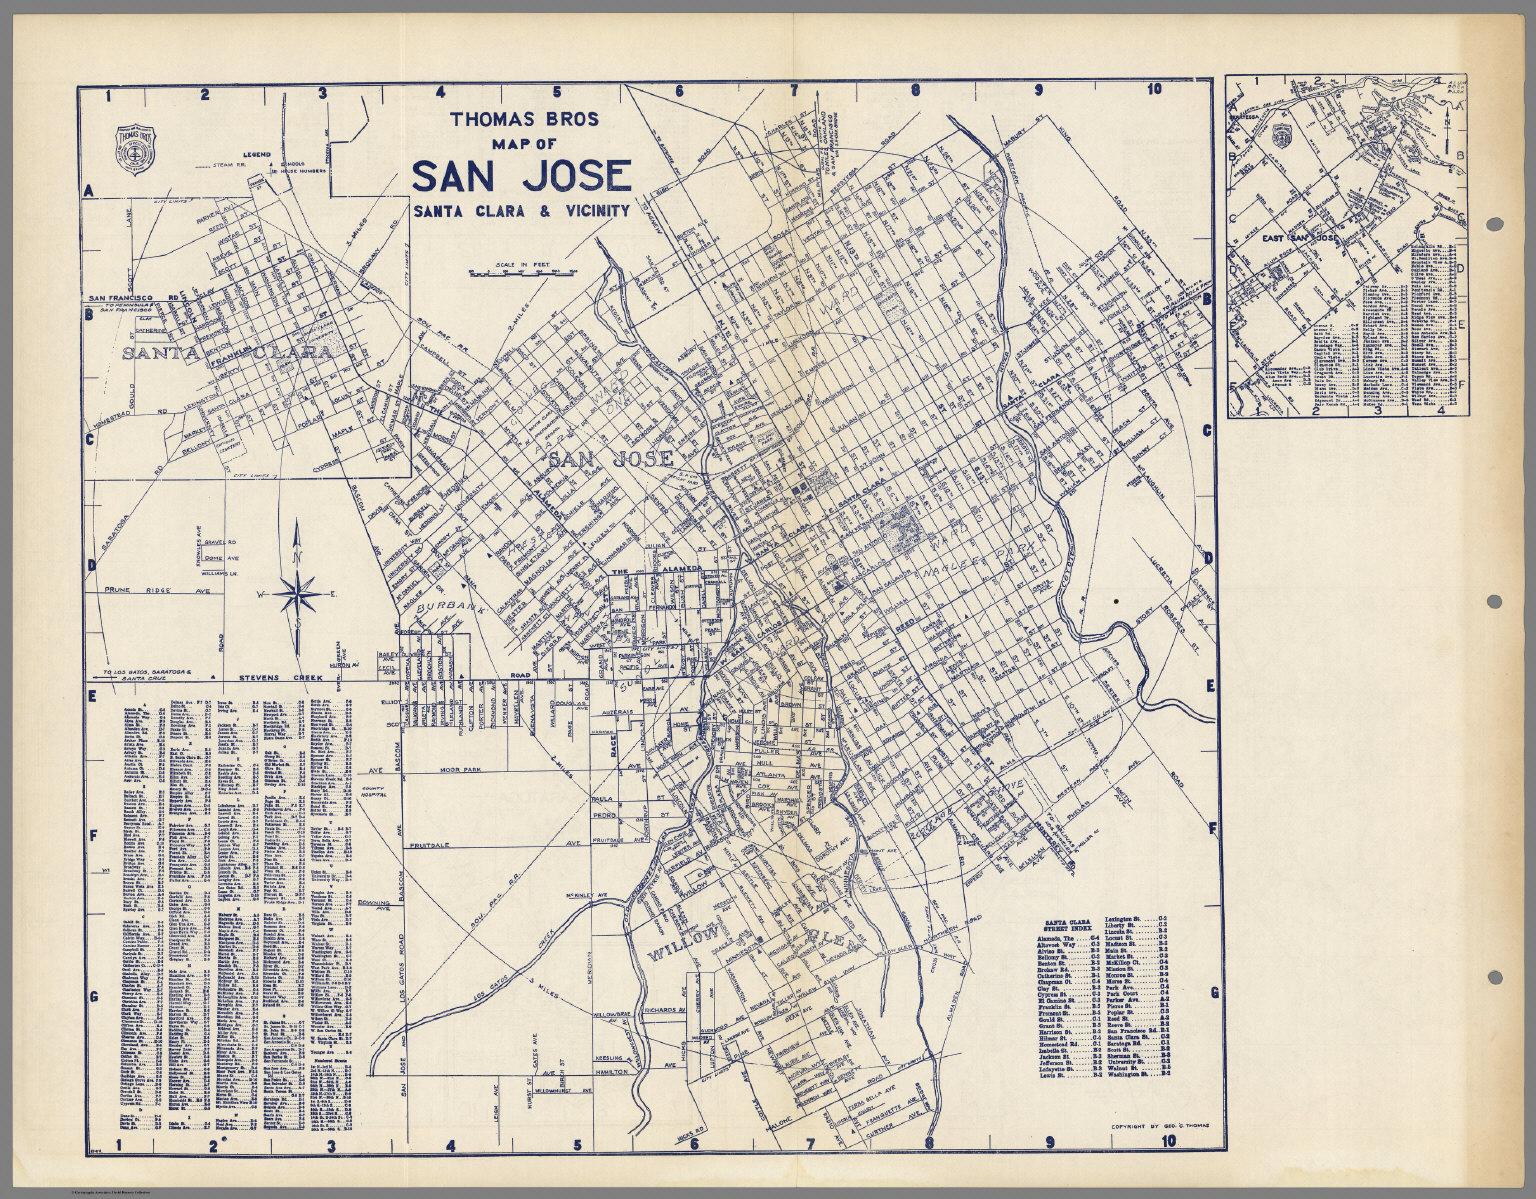 Thomas Bros Map of San Jose, Santa Clara & Vicinity, California ...